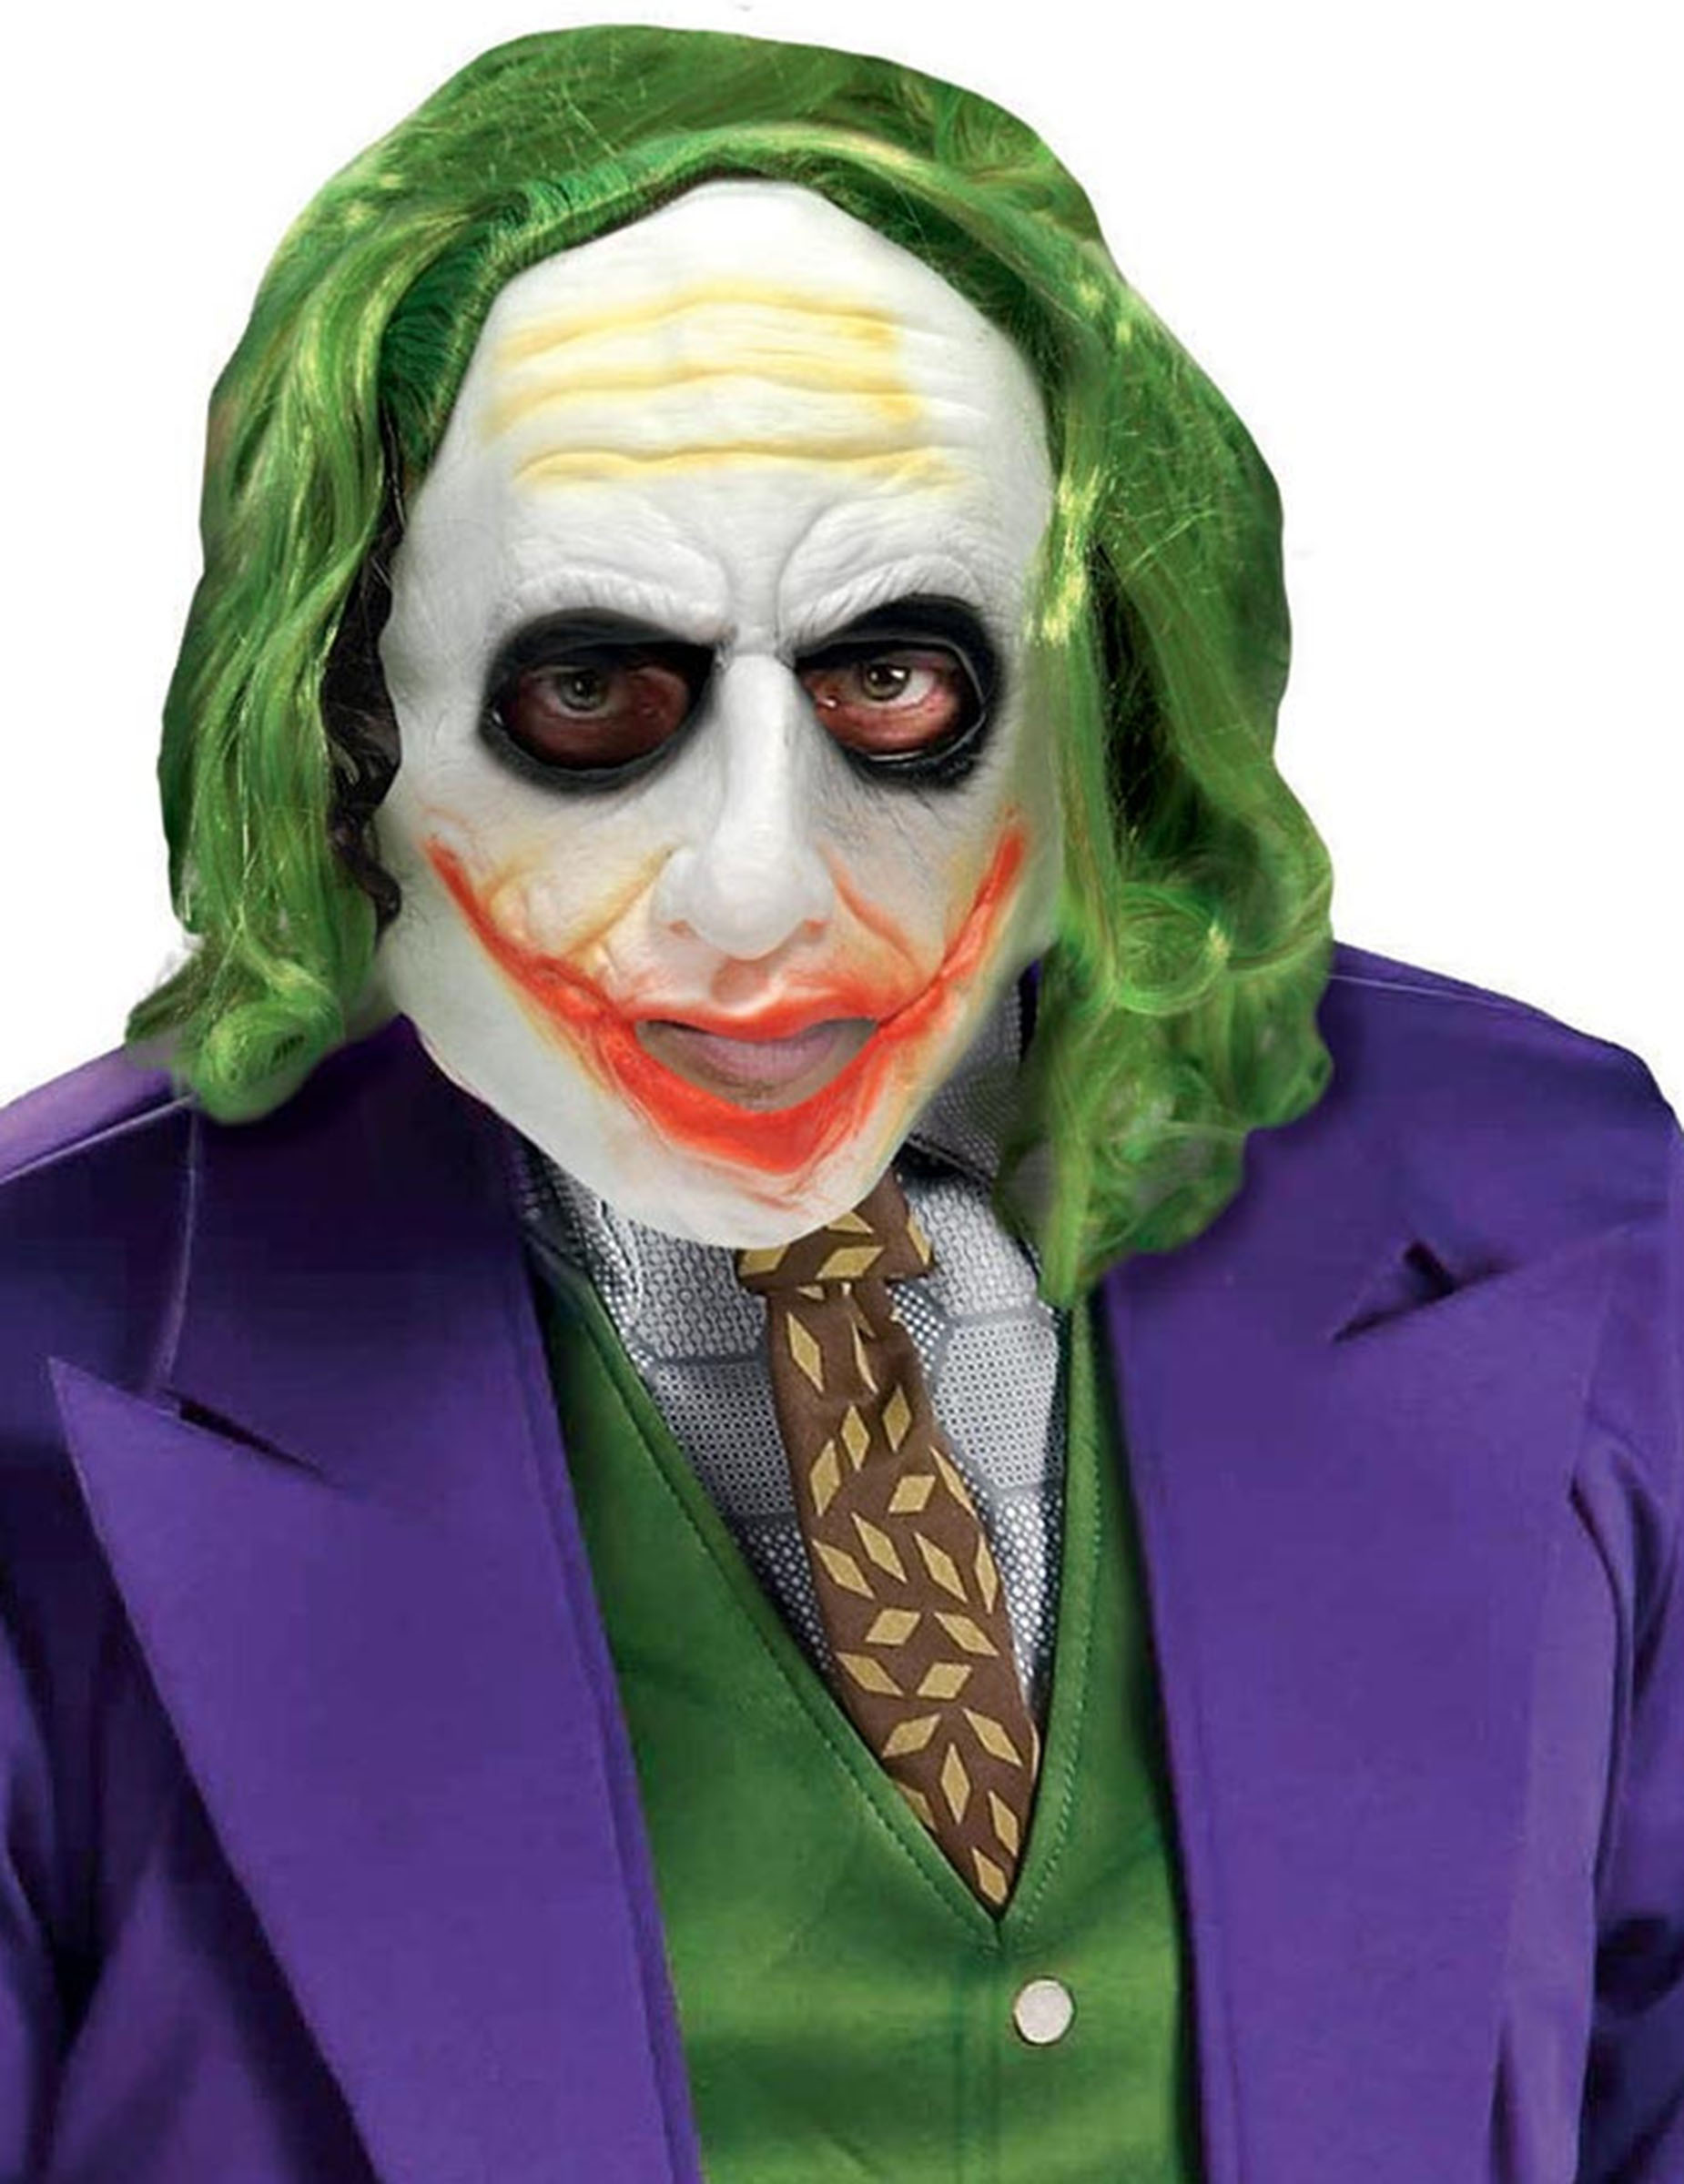 Maschera de luxe joker™ adulto maschere e vestiti di carnevale